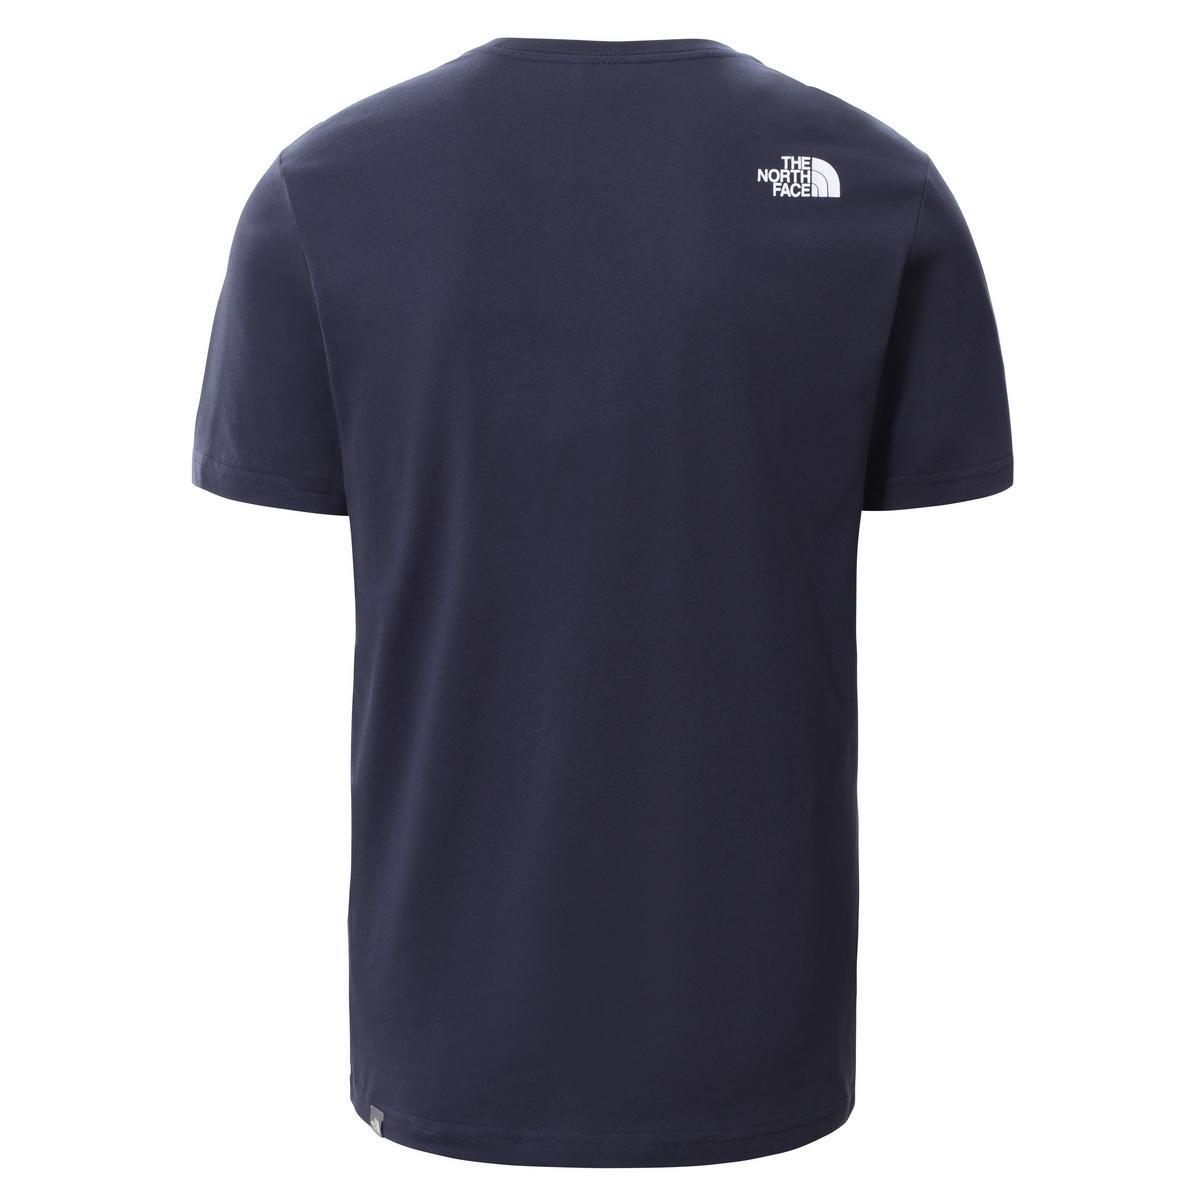 The North Face Men's NSE T-Shirt - Navy